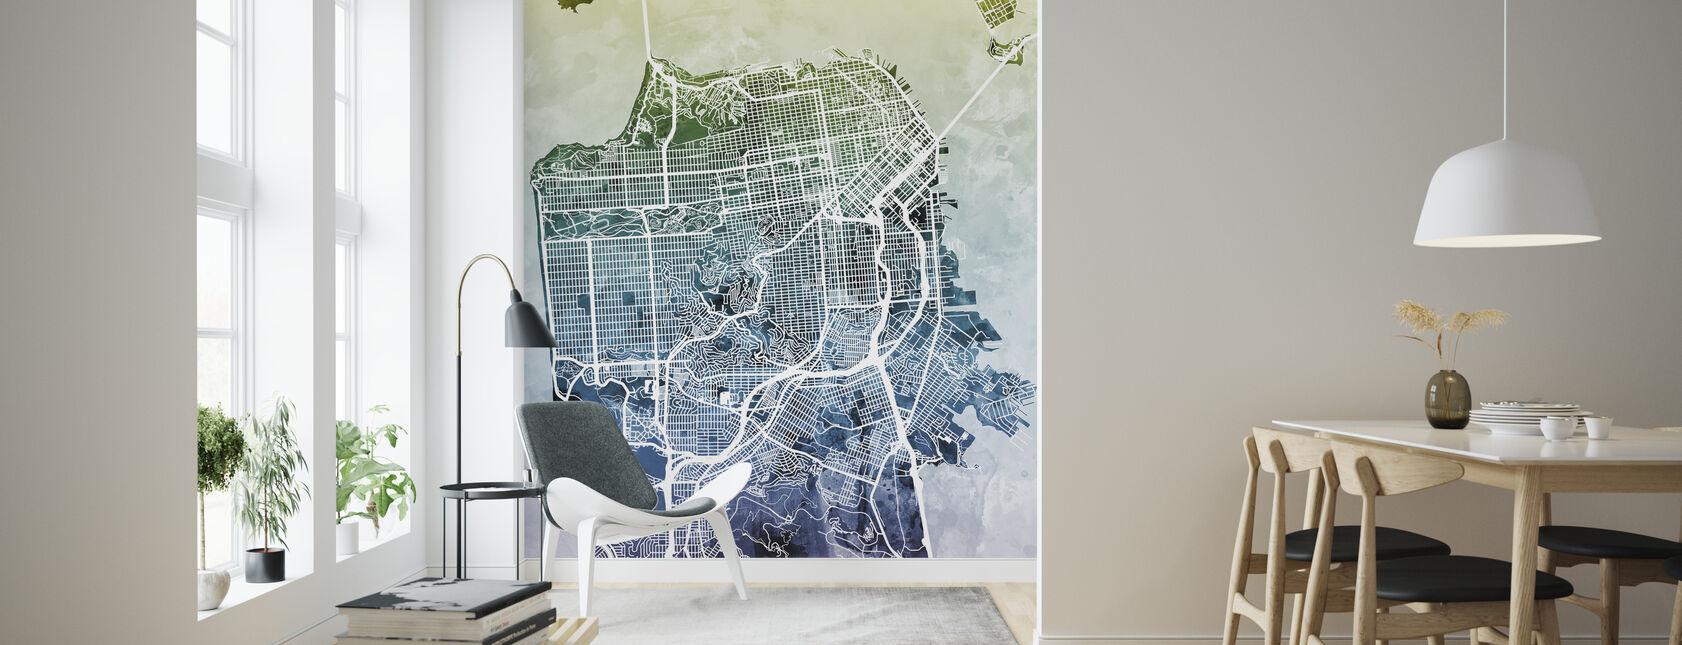 San Fransisco Street Map Bluegreen - Tapet - Stue